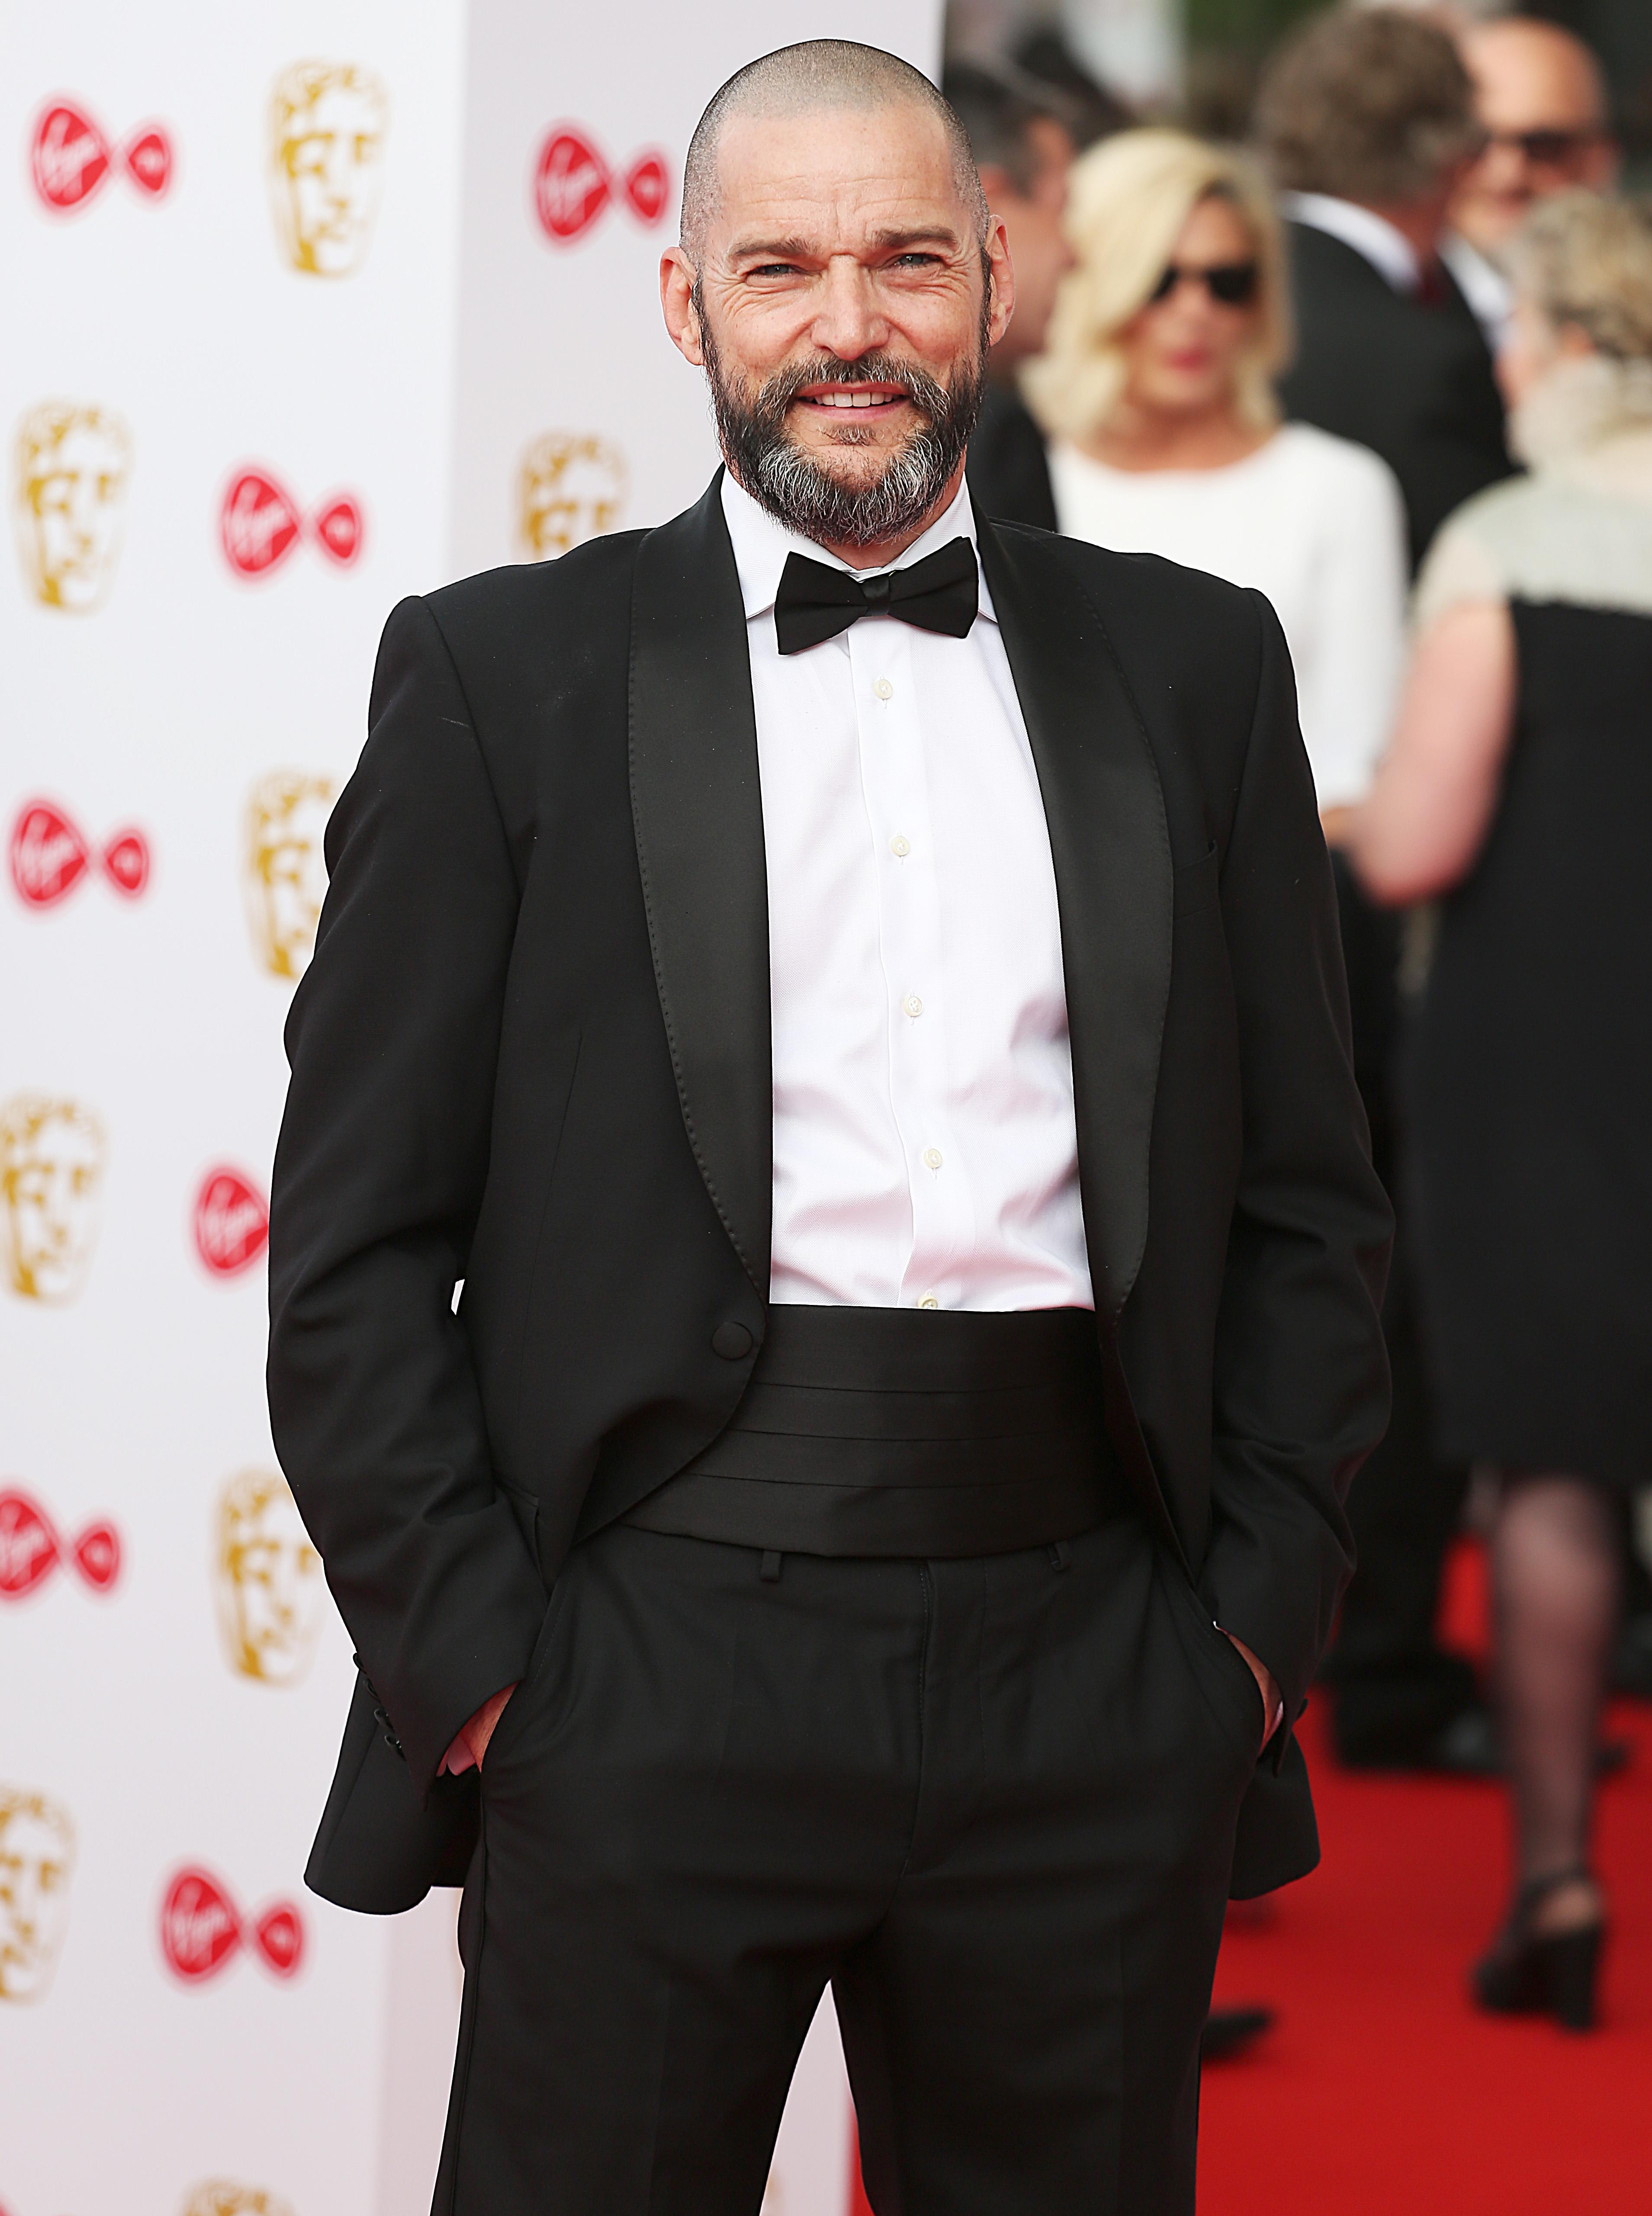 Fred Sirieix at The Virgin TV British Academy Television Awards 2018